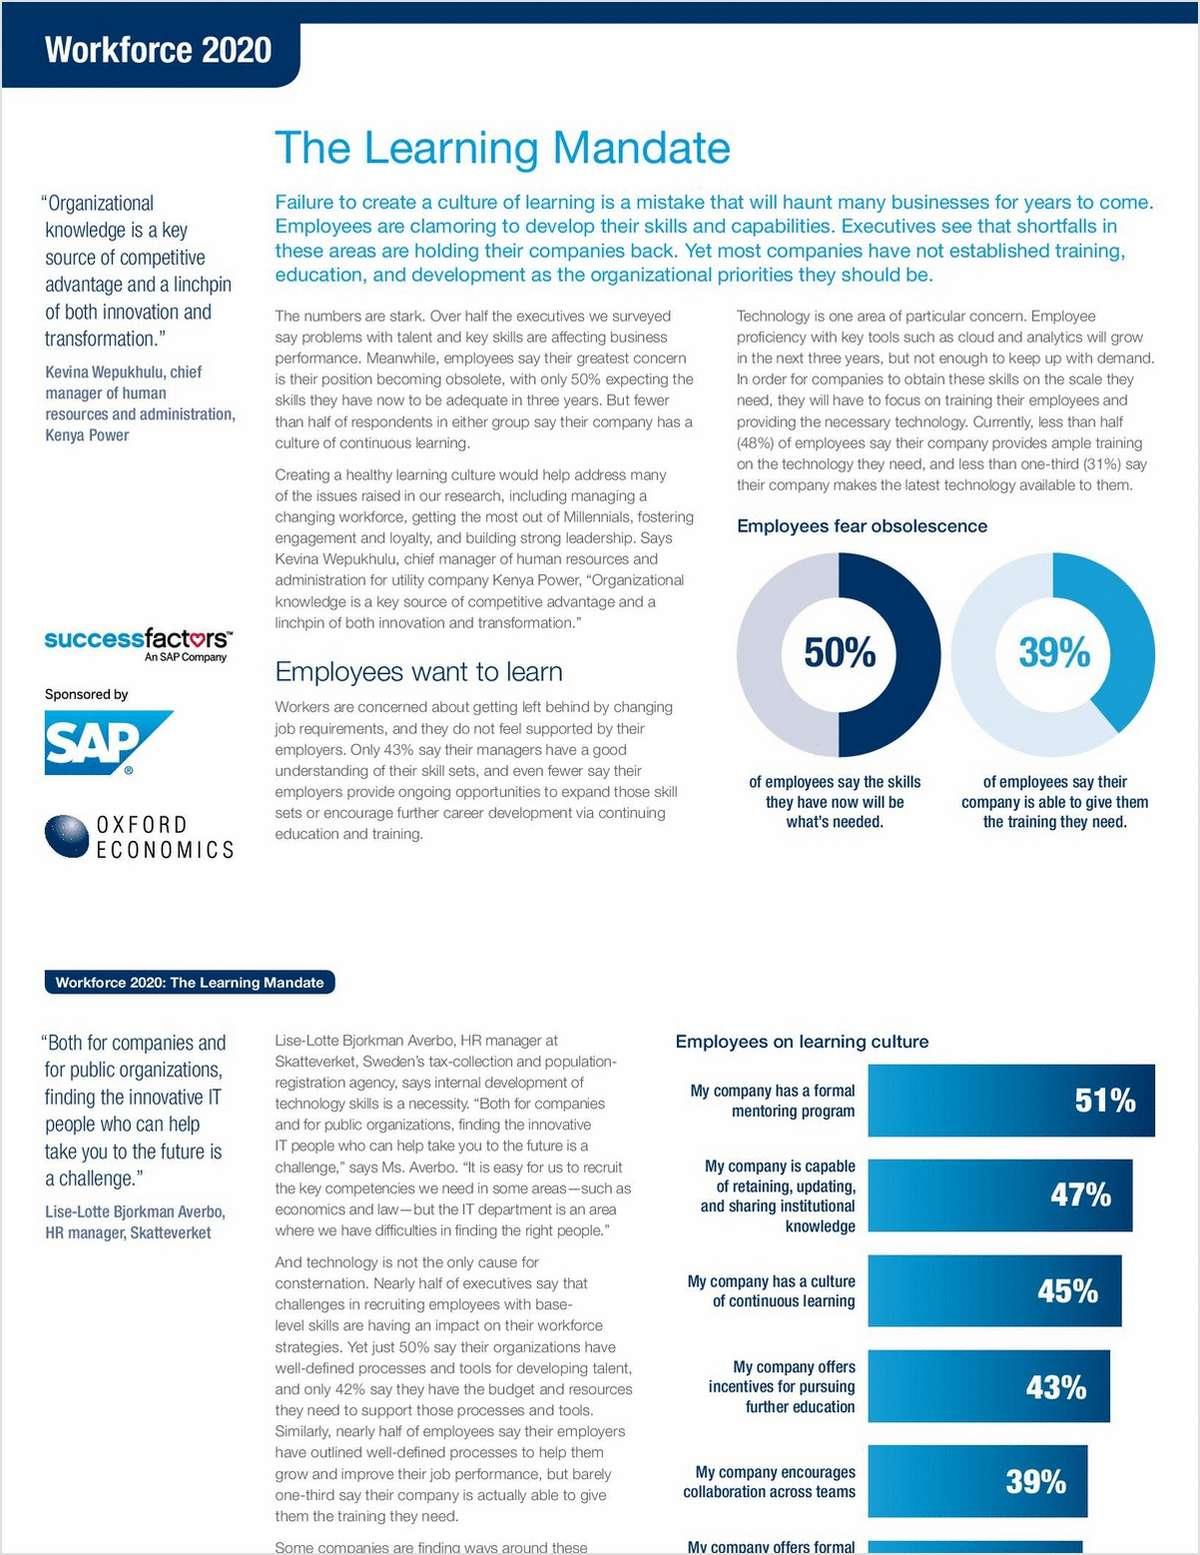 Workforce 2020 Think Piece 4 – Bridging the Skills Gap: The Learning Mandate